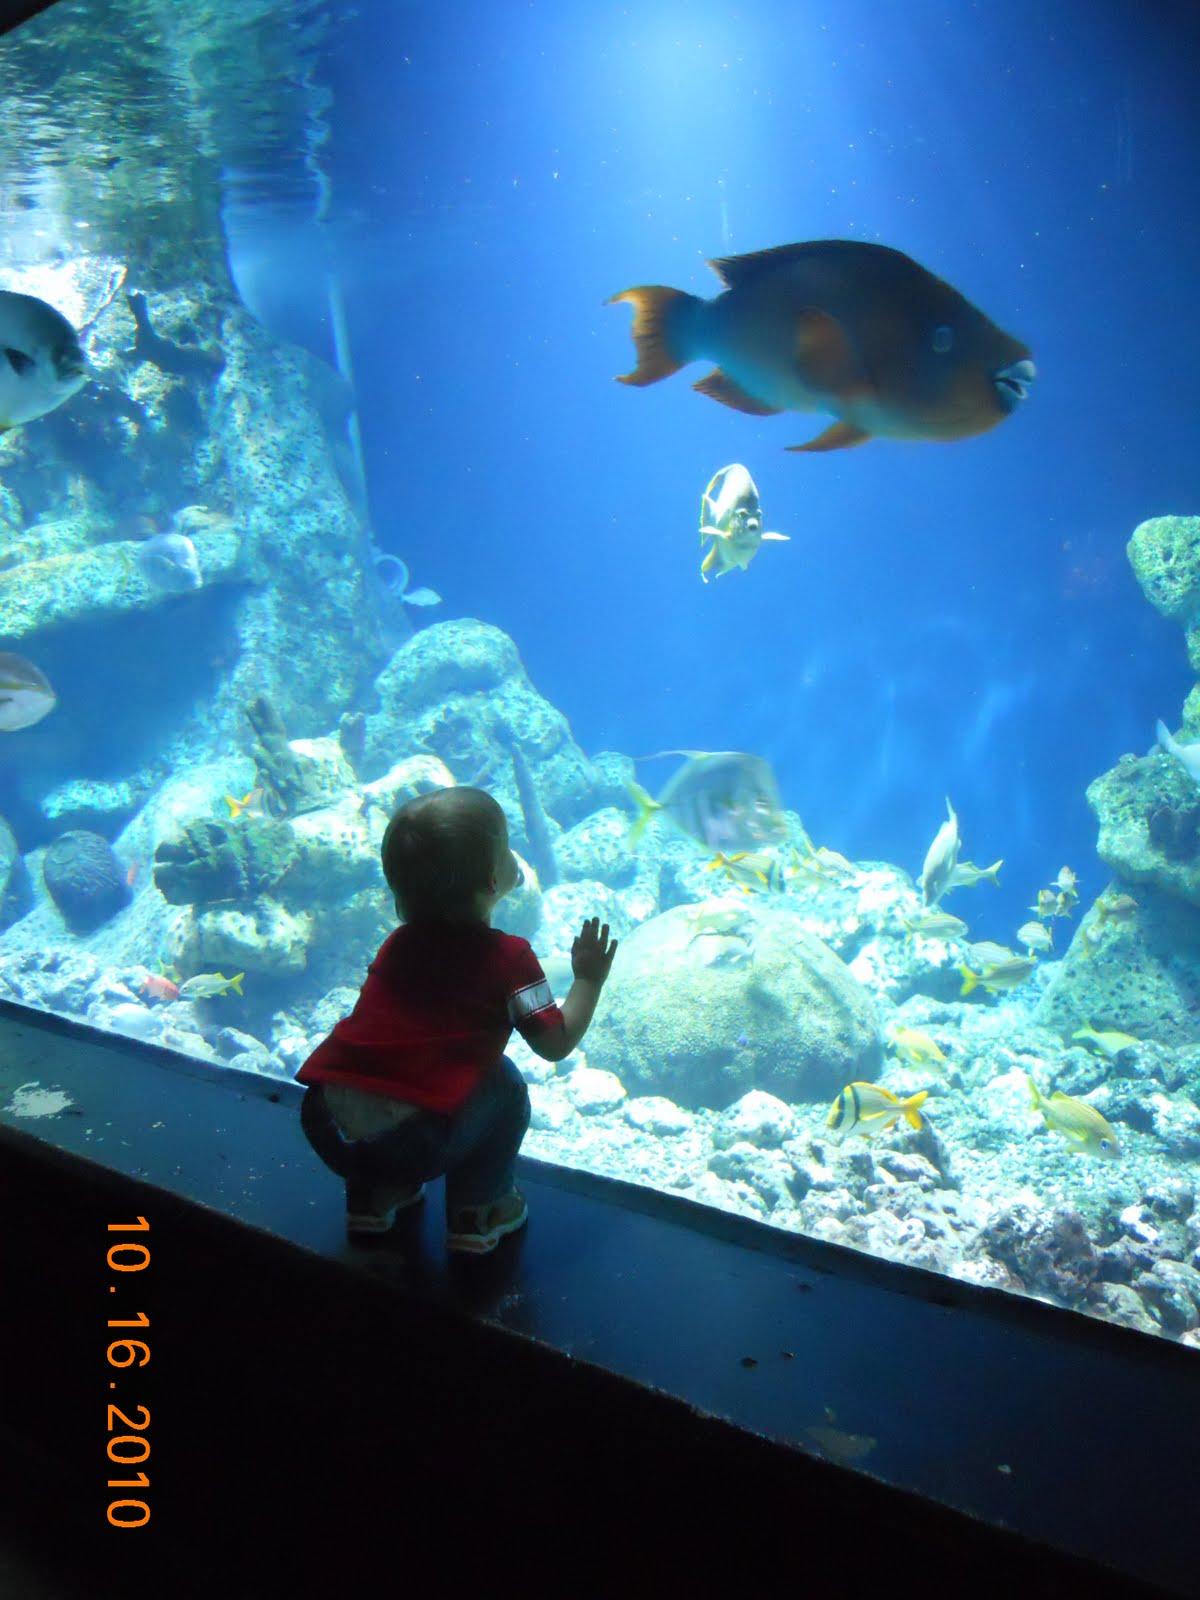 Adventures with the Nickelson's: Tulsa Aquarium